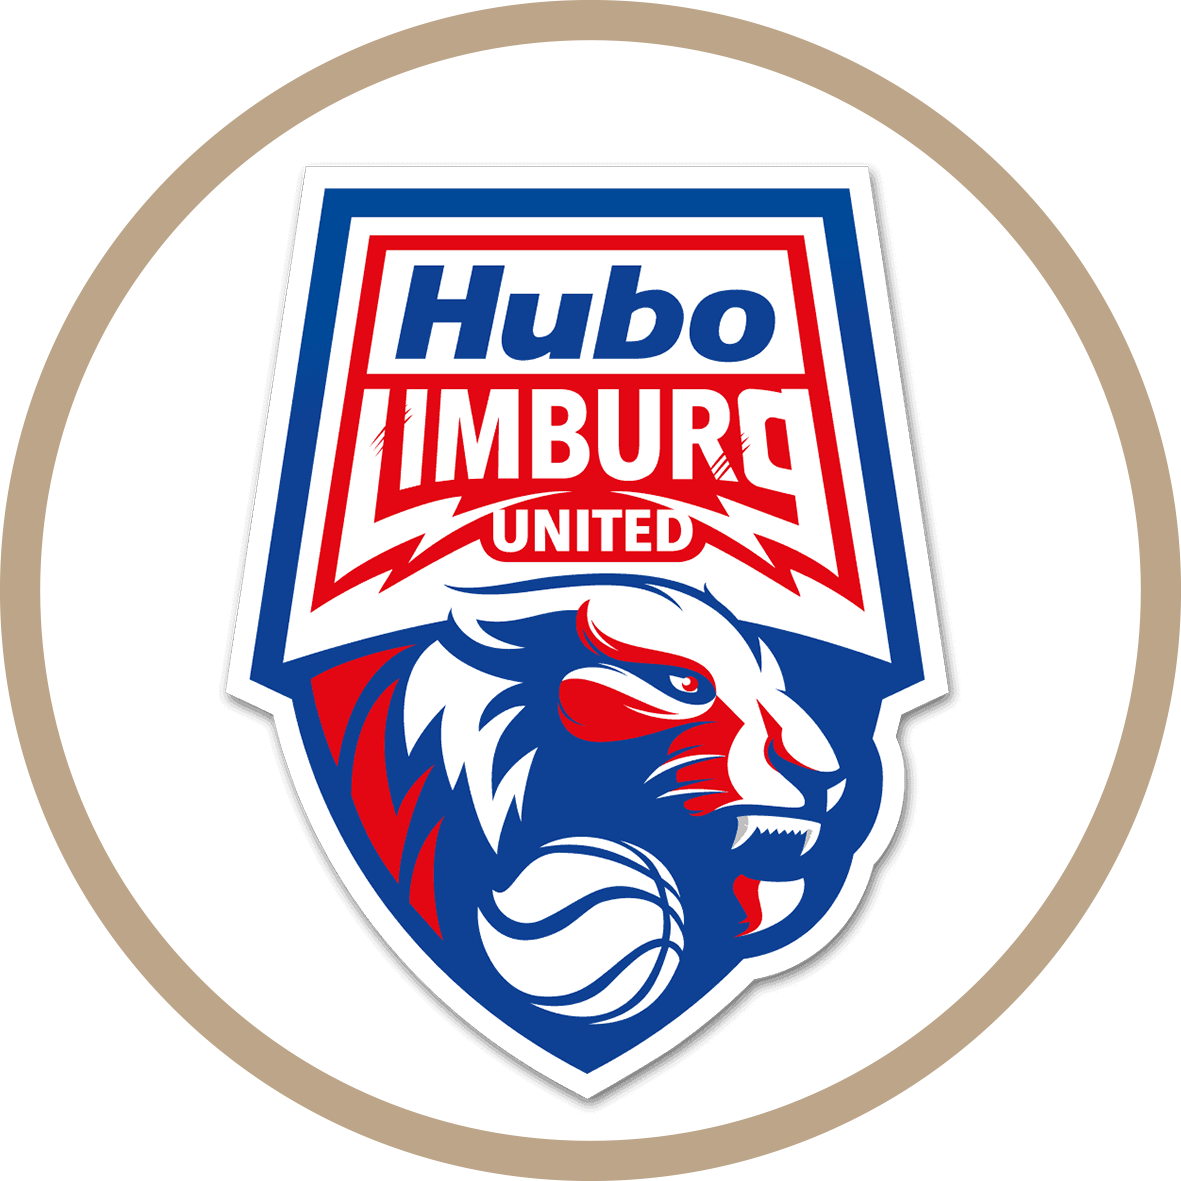 Hubo Limburg United Hasselt